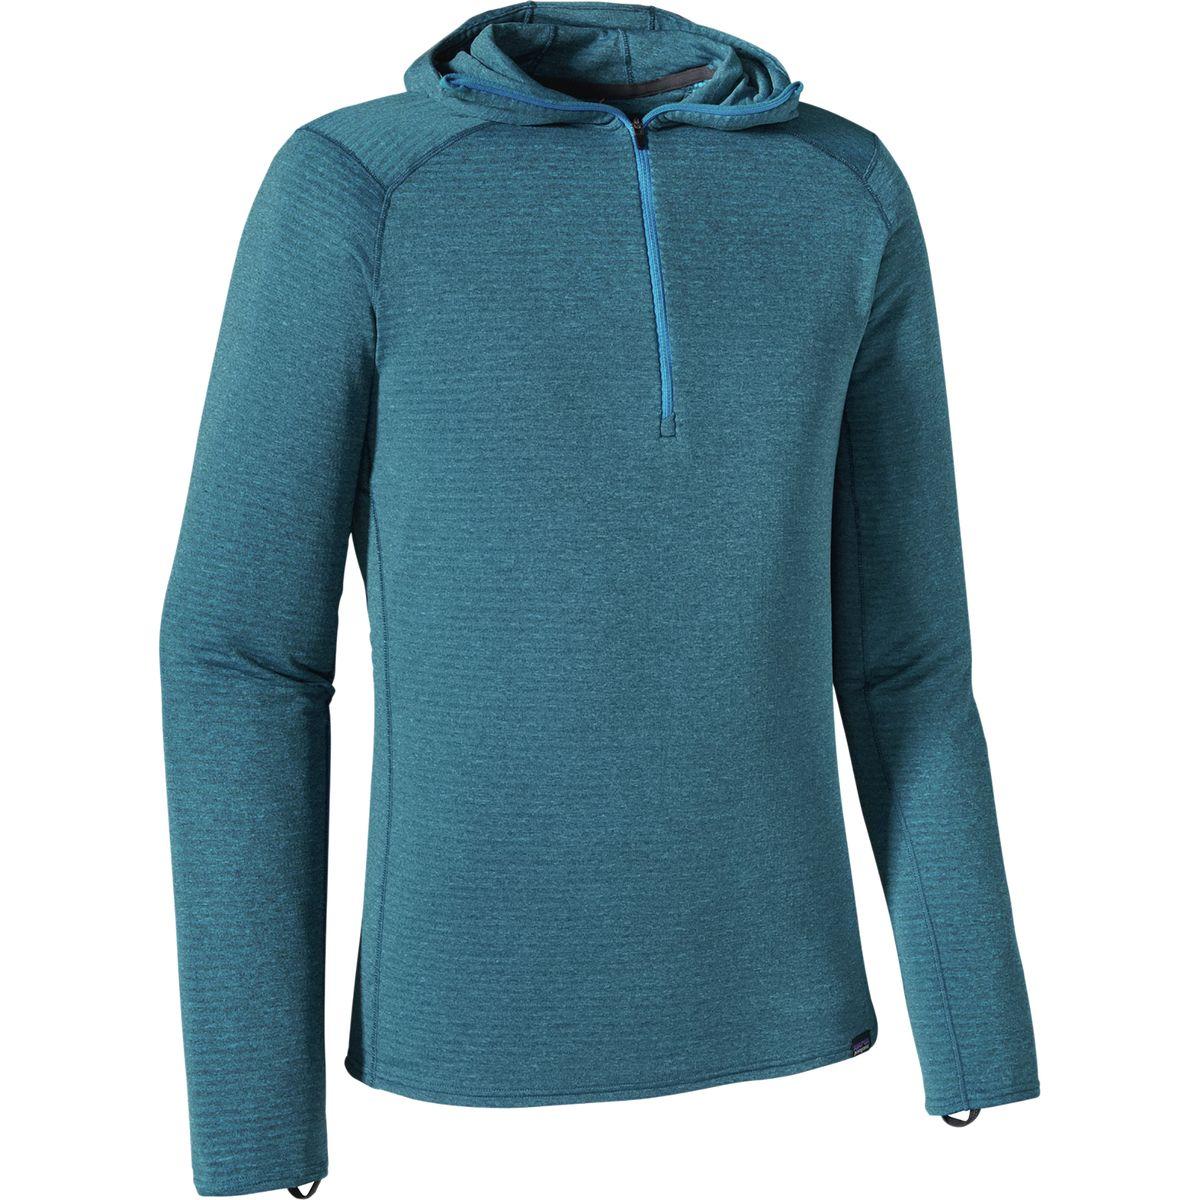 Patagonia Capilene Thermal Weight Hooded Zip-Neck Top - Men